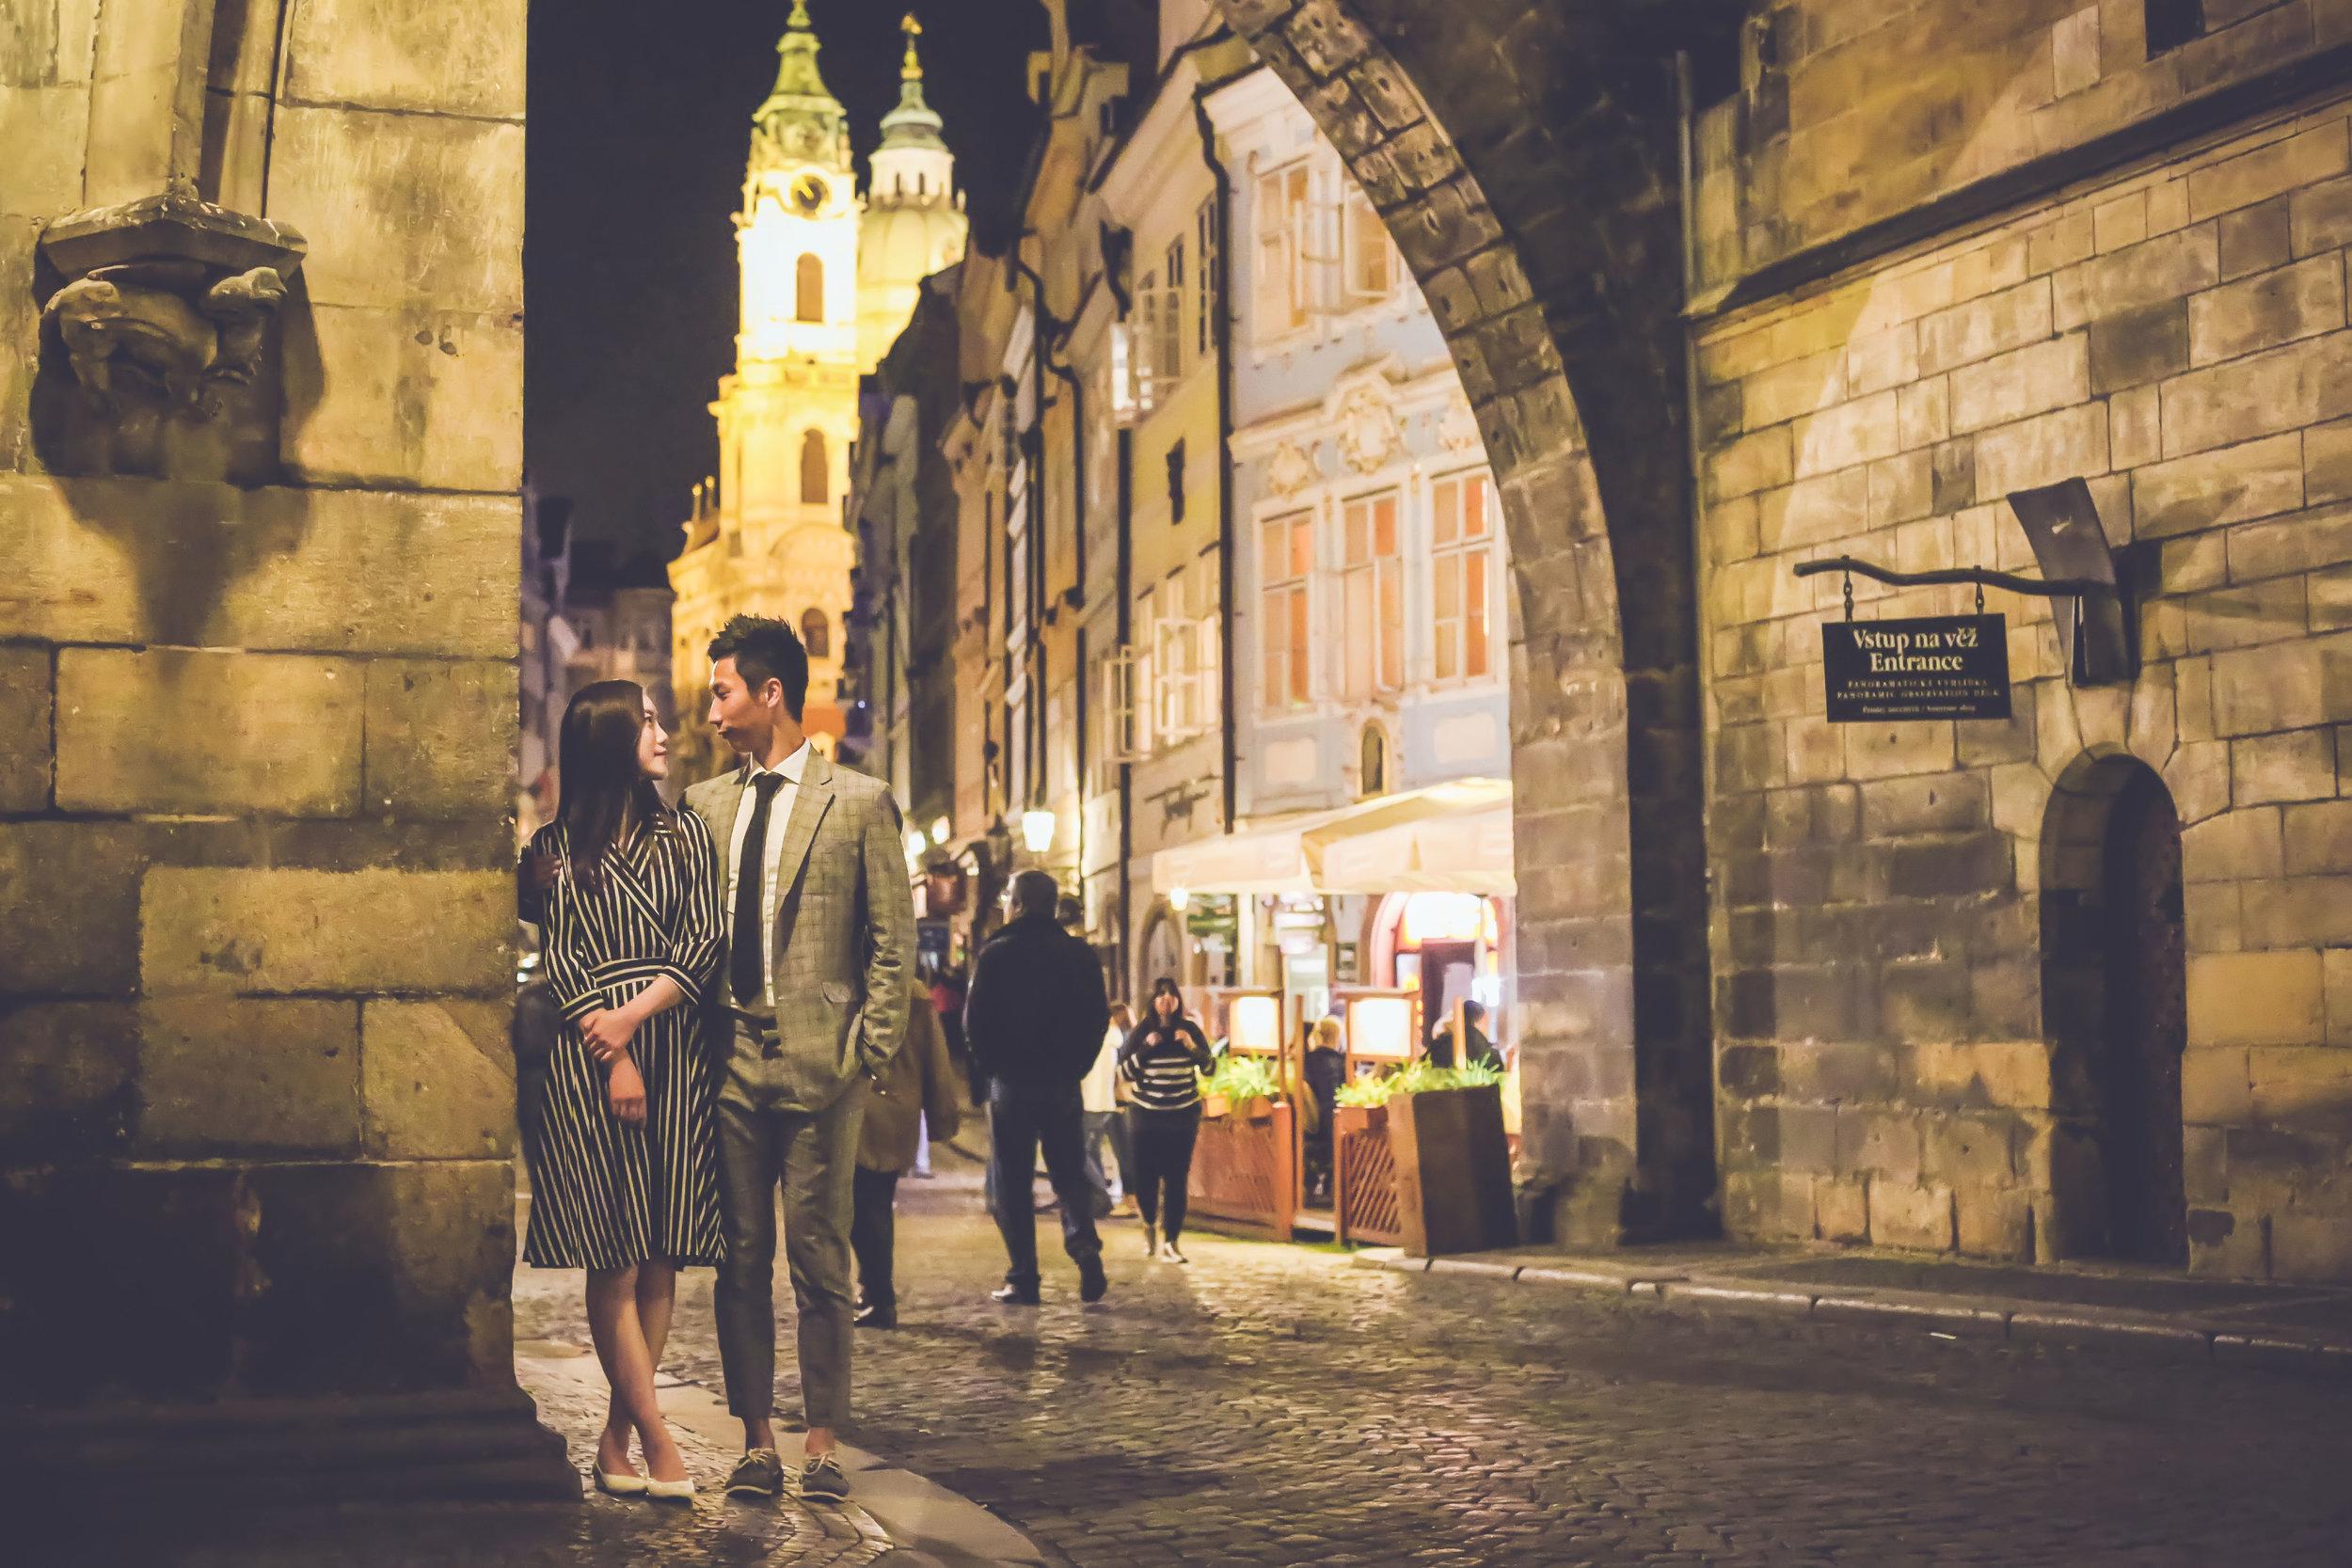 Sprazzi_Professional_Photography_Photographer_Prague_Czech-Republic_Irene_Original_7.jpg